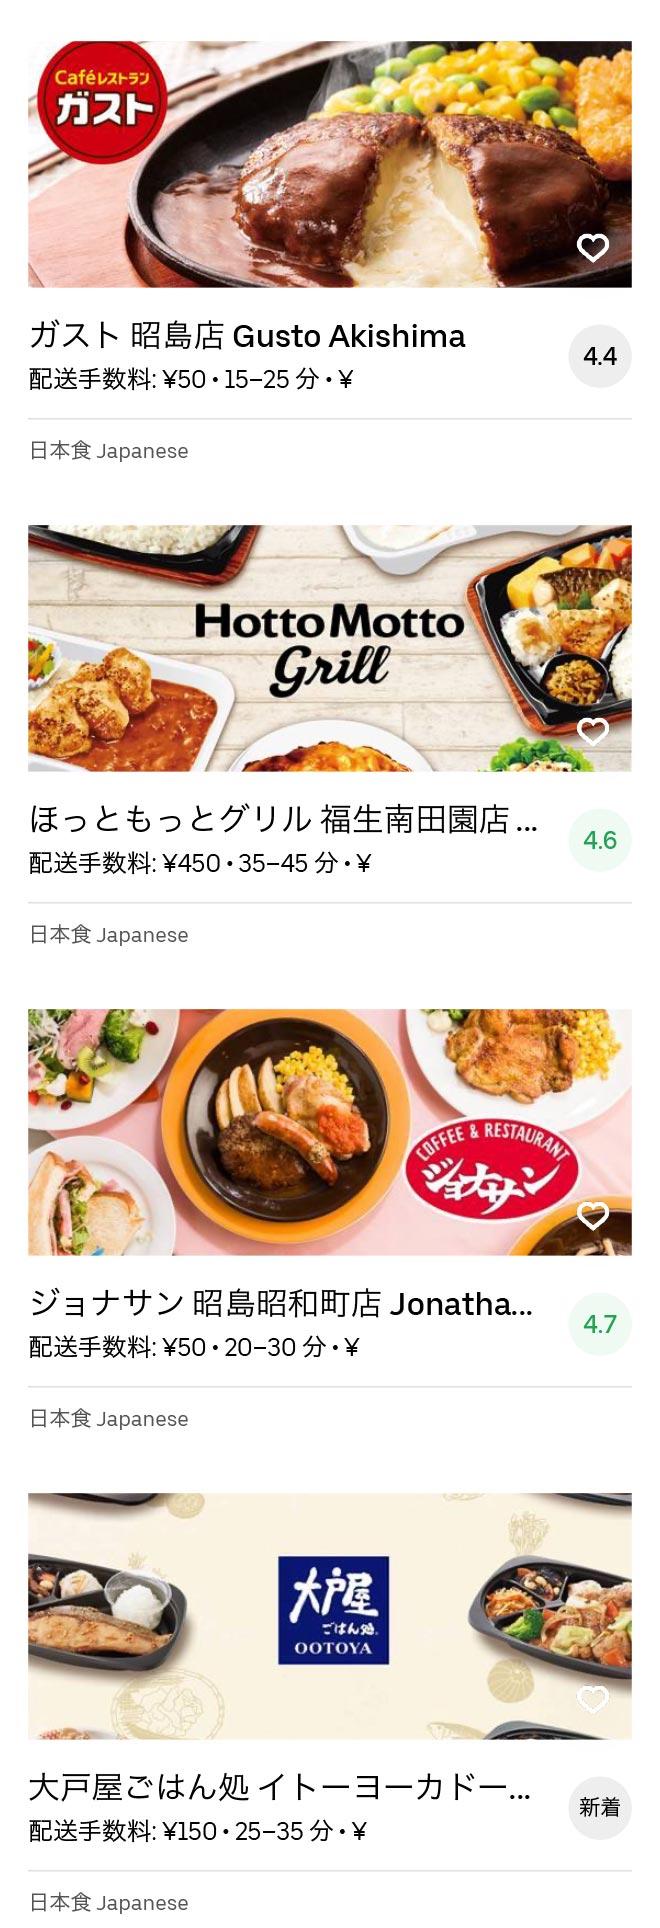 Akishima menu 2004 02